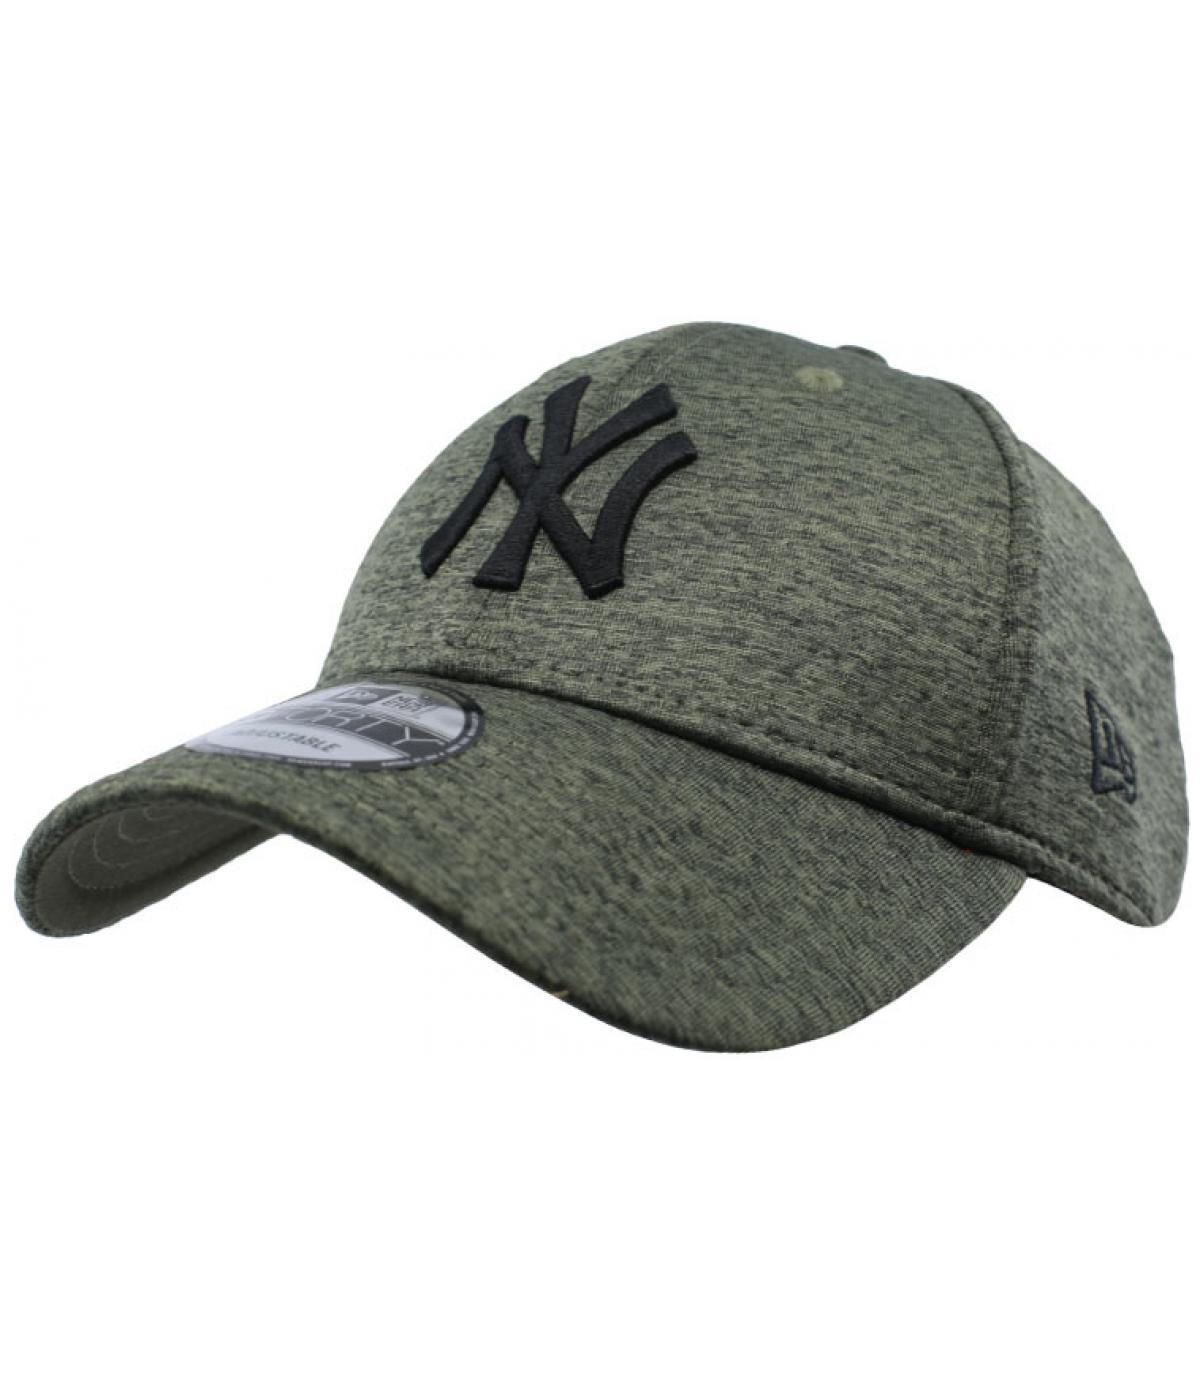 idrorepellente verde NY cap